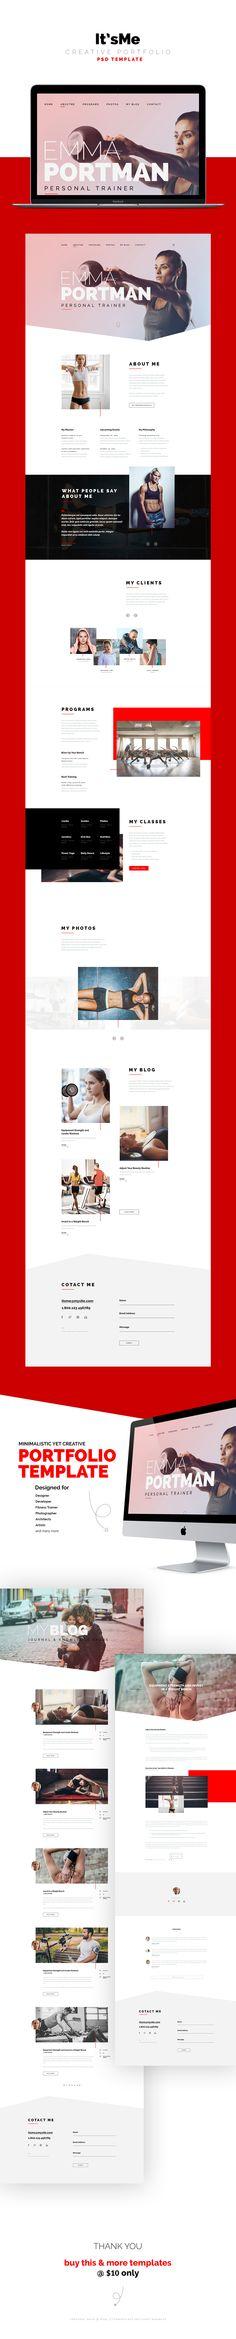 It'sMe - Creative Portfolio PSD Template on Behance